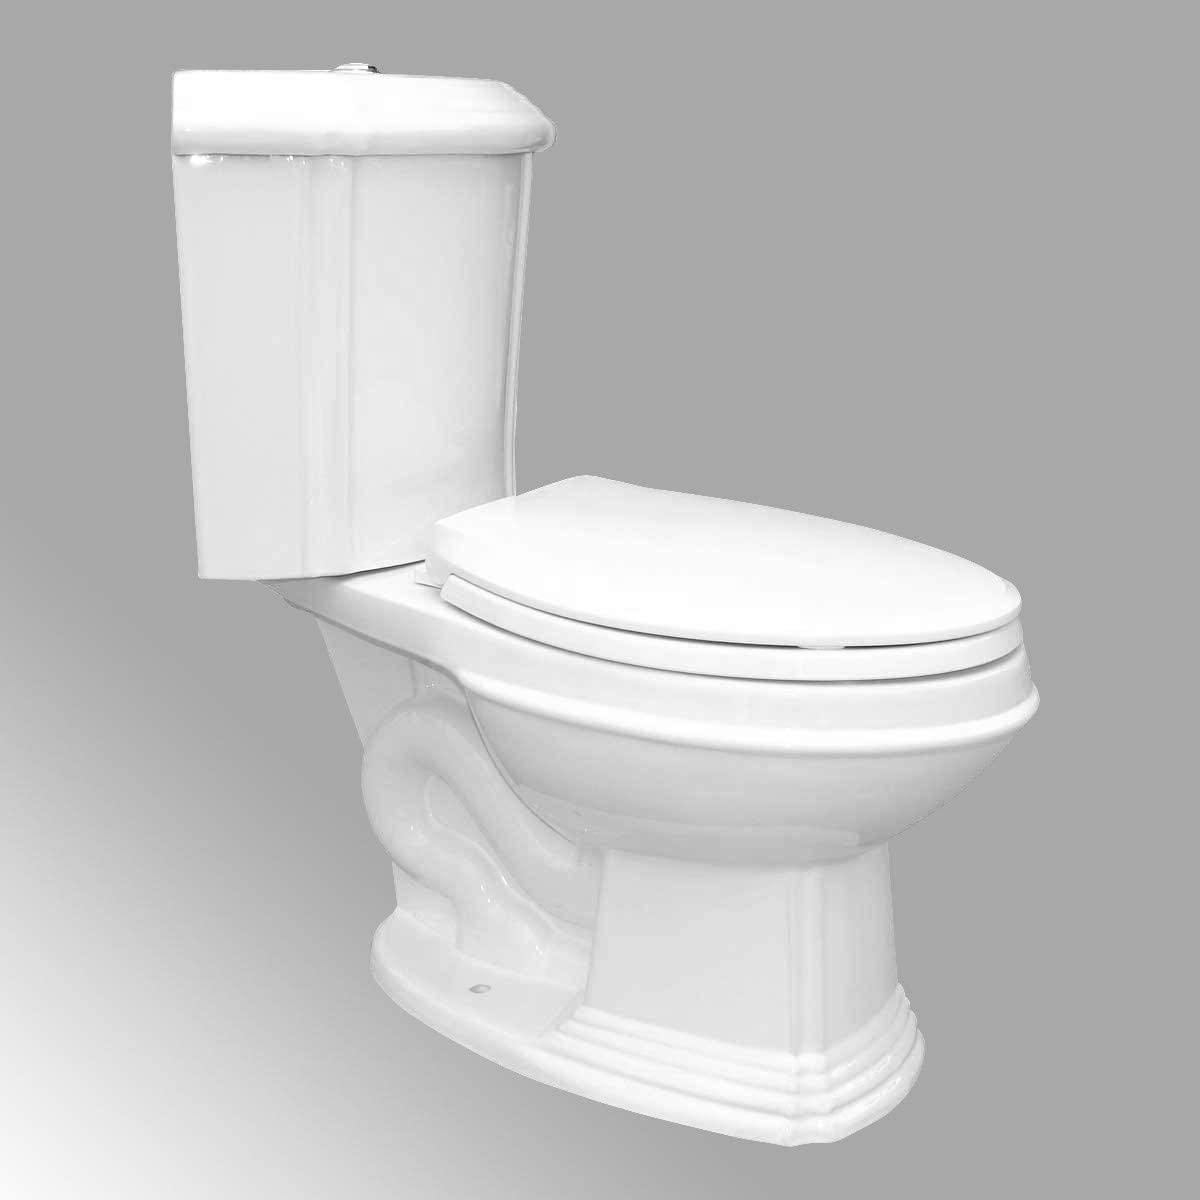 Sheffield Corner 2-Piece WaterSense corner toilet